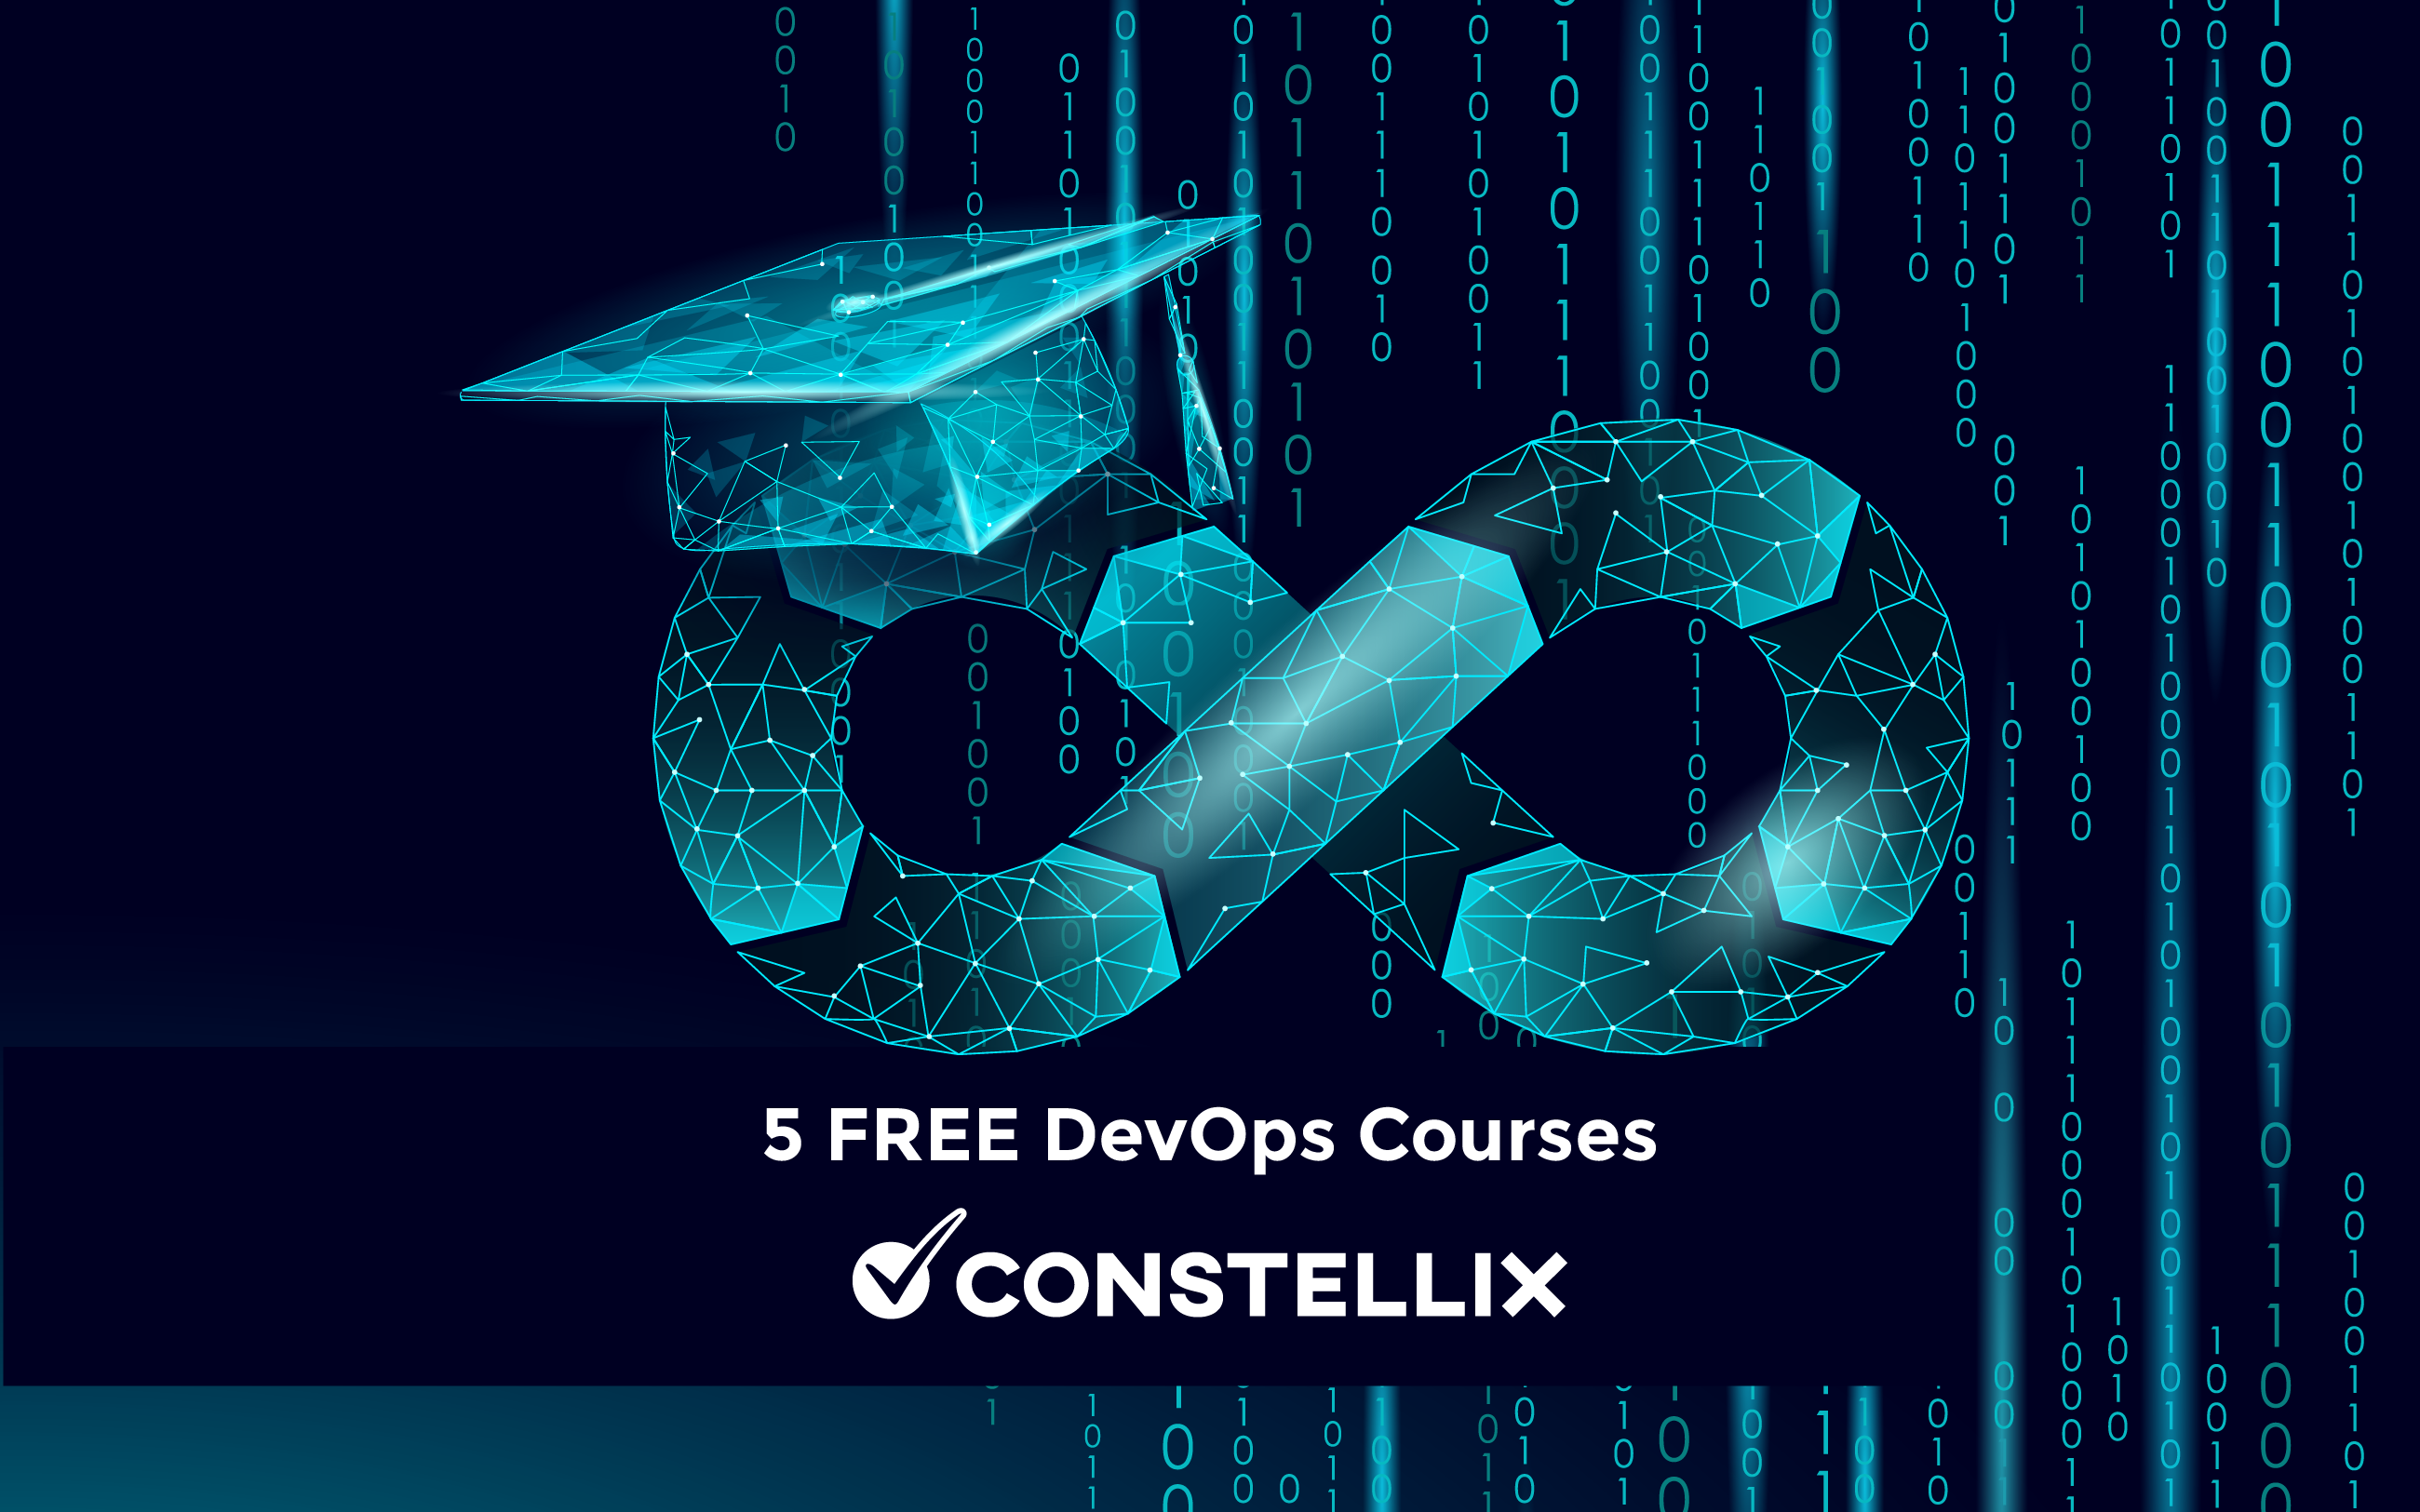 5 Free DevOps Courses for Beginners